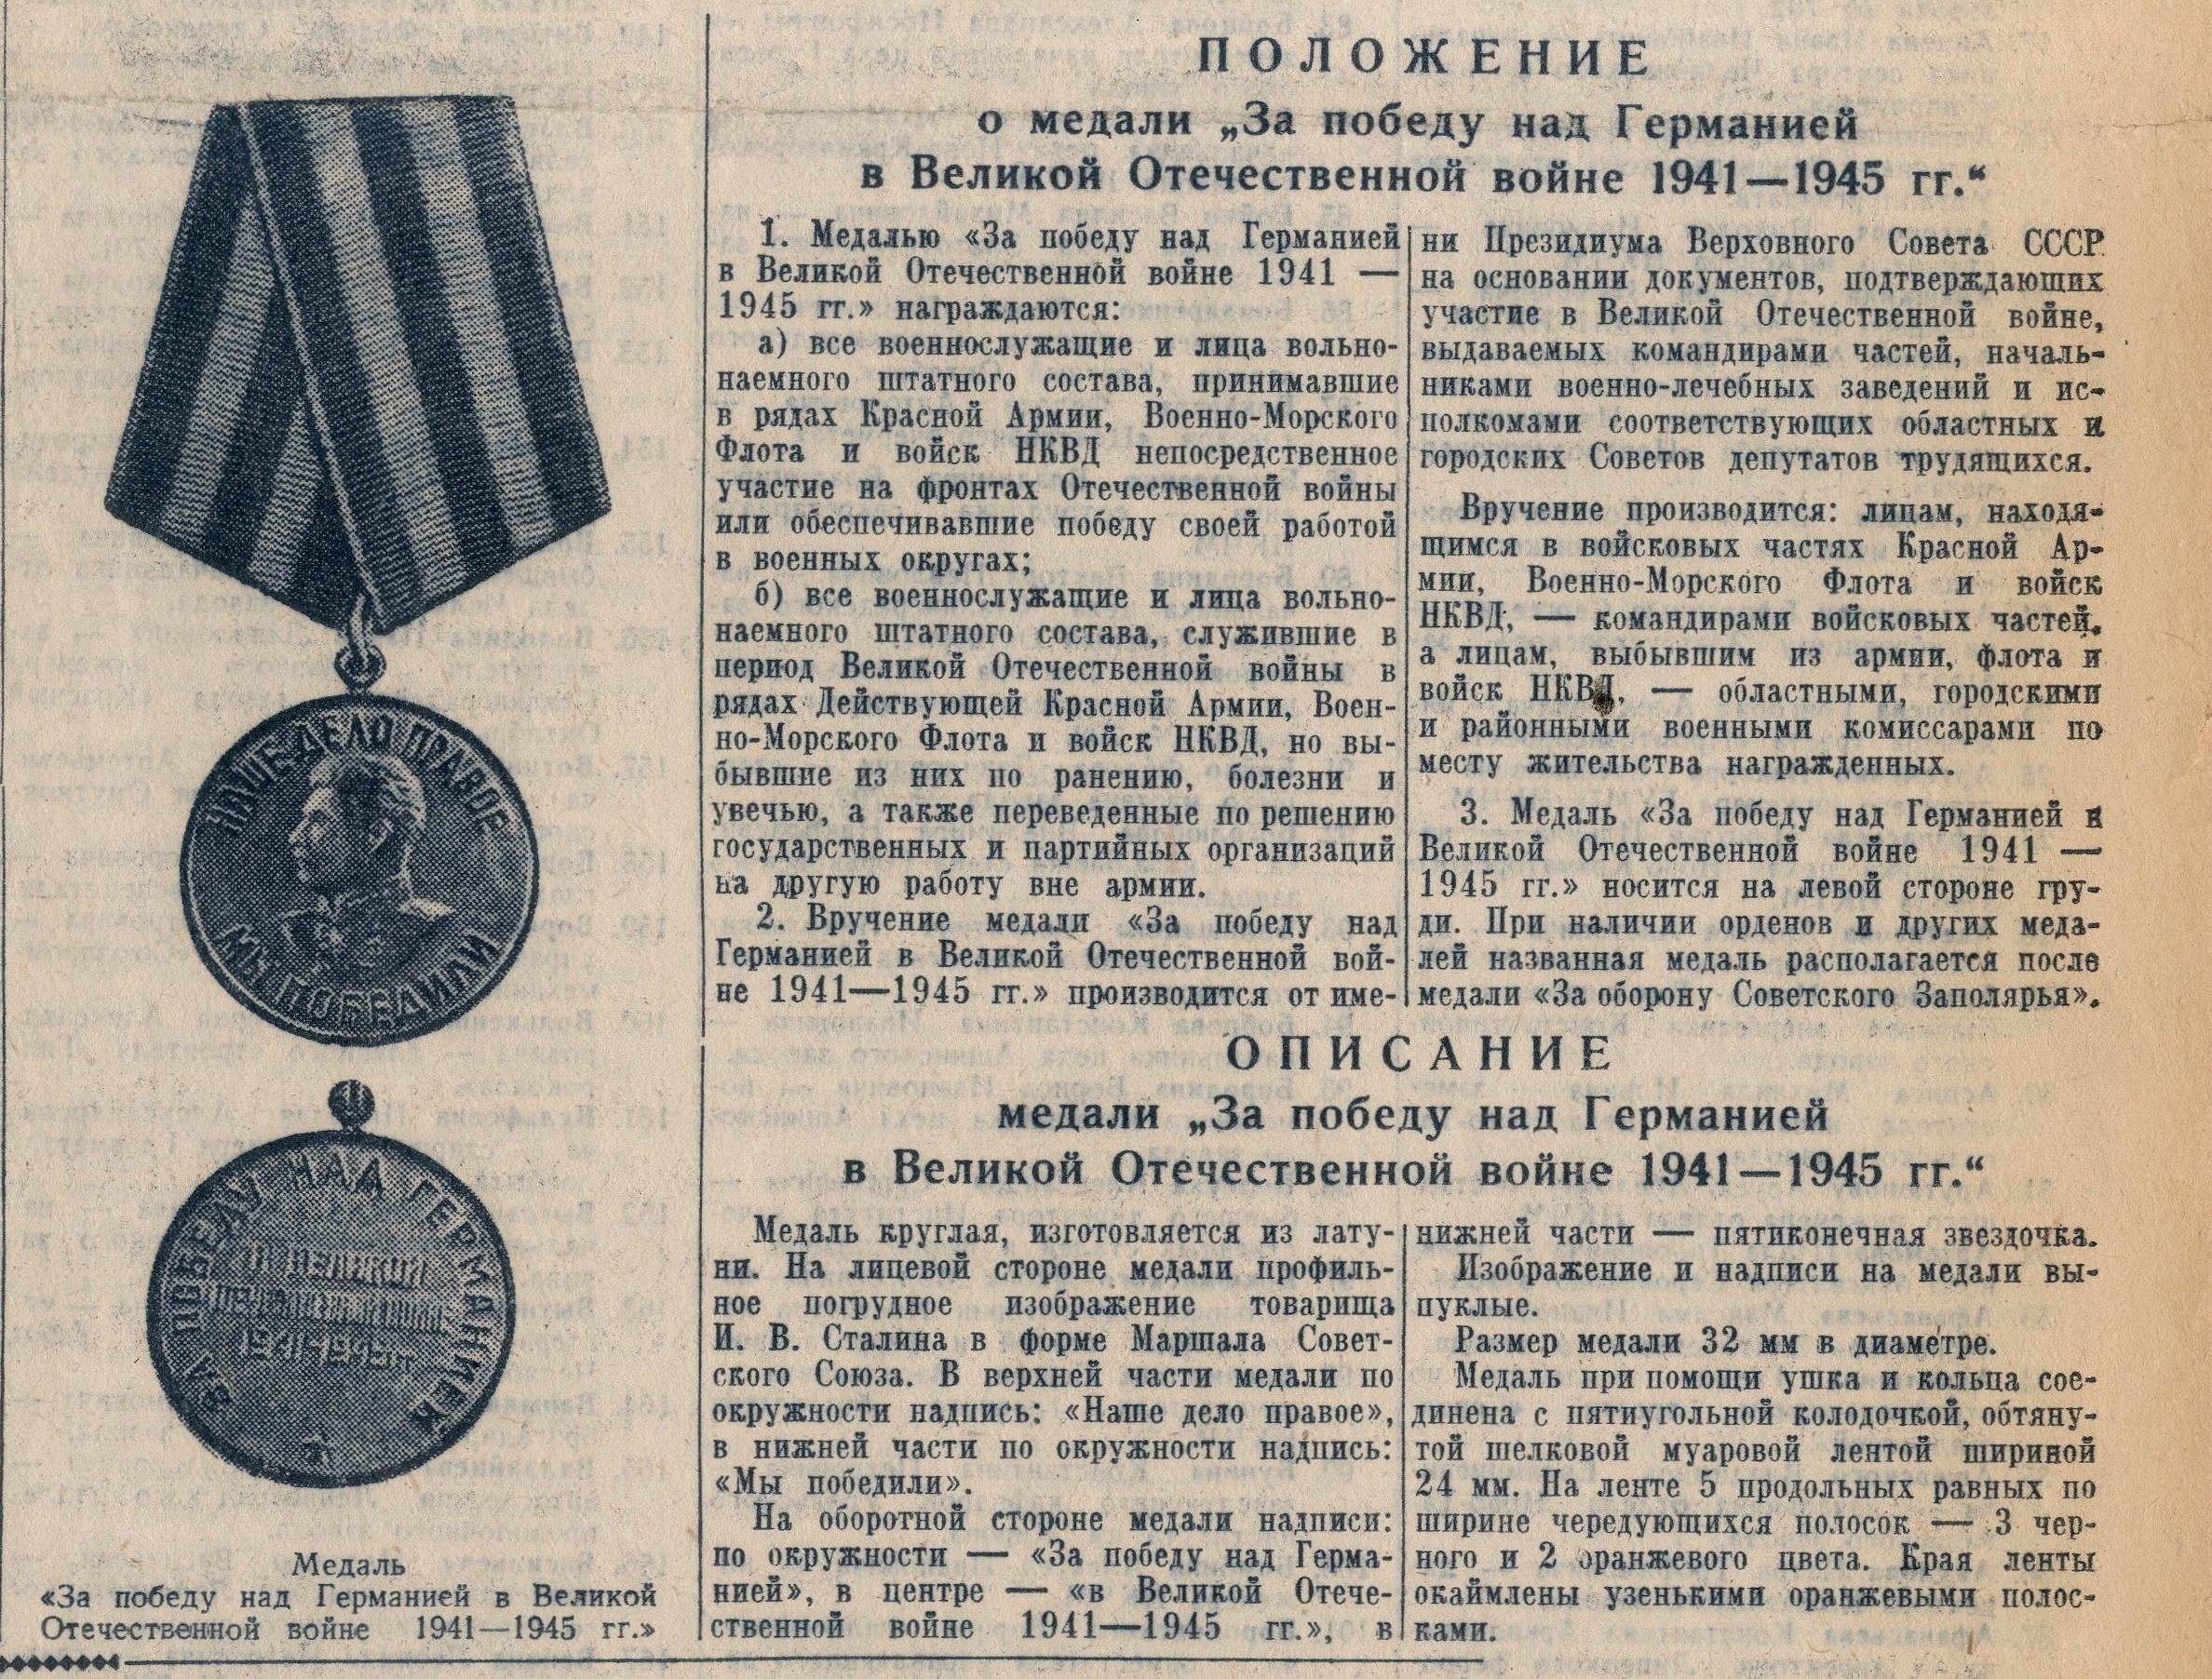 MedalVict2